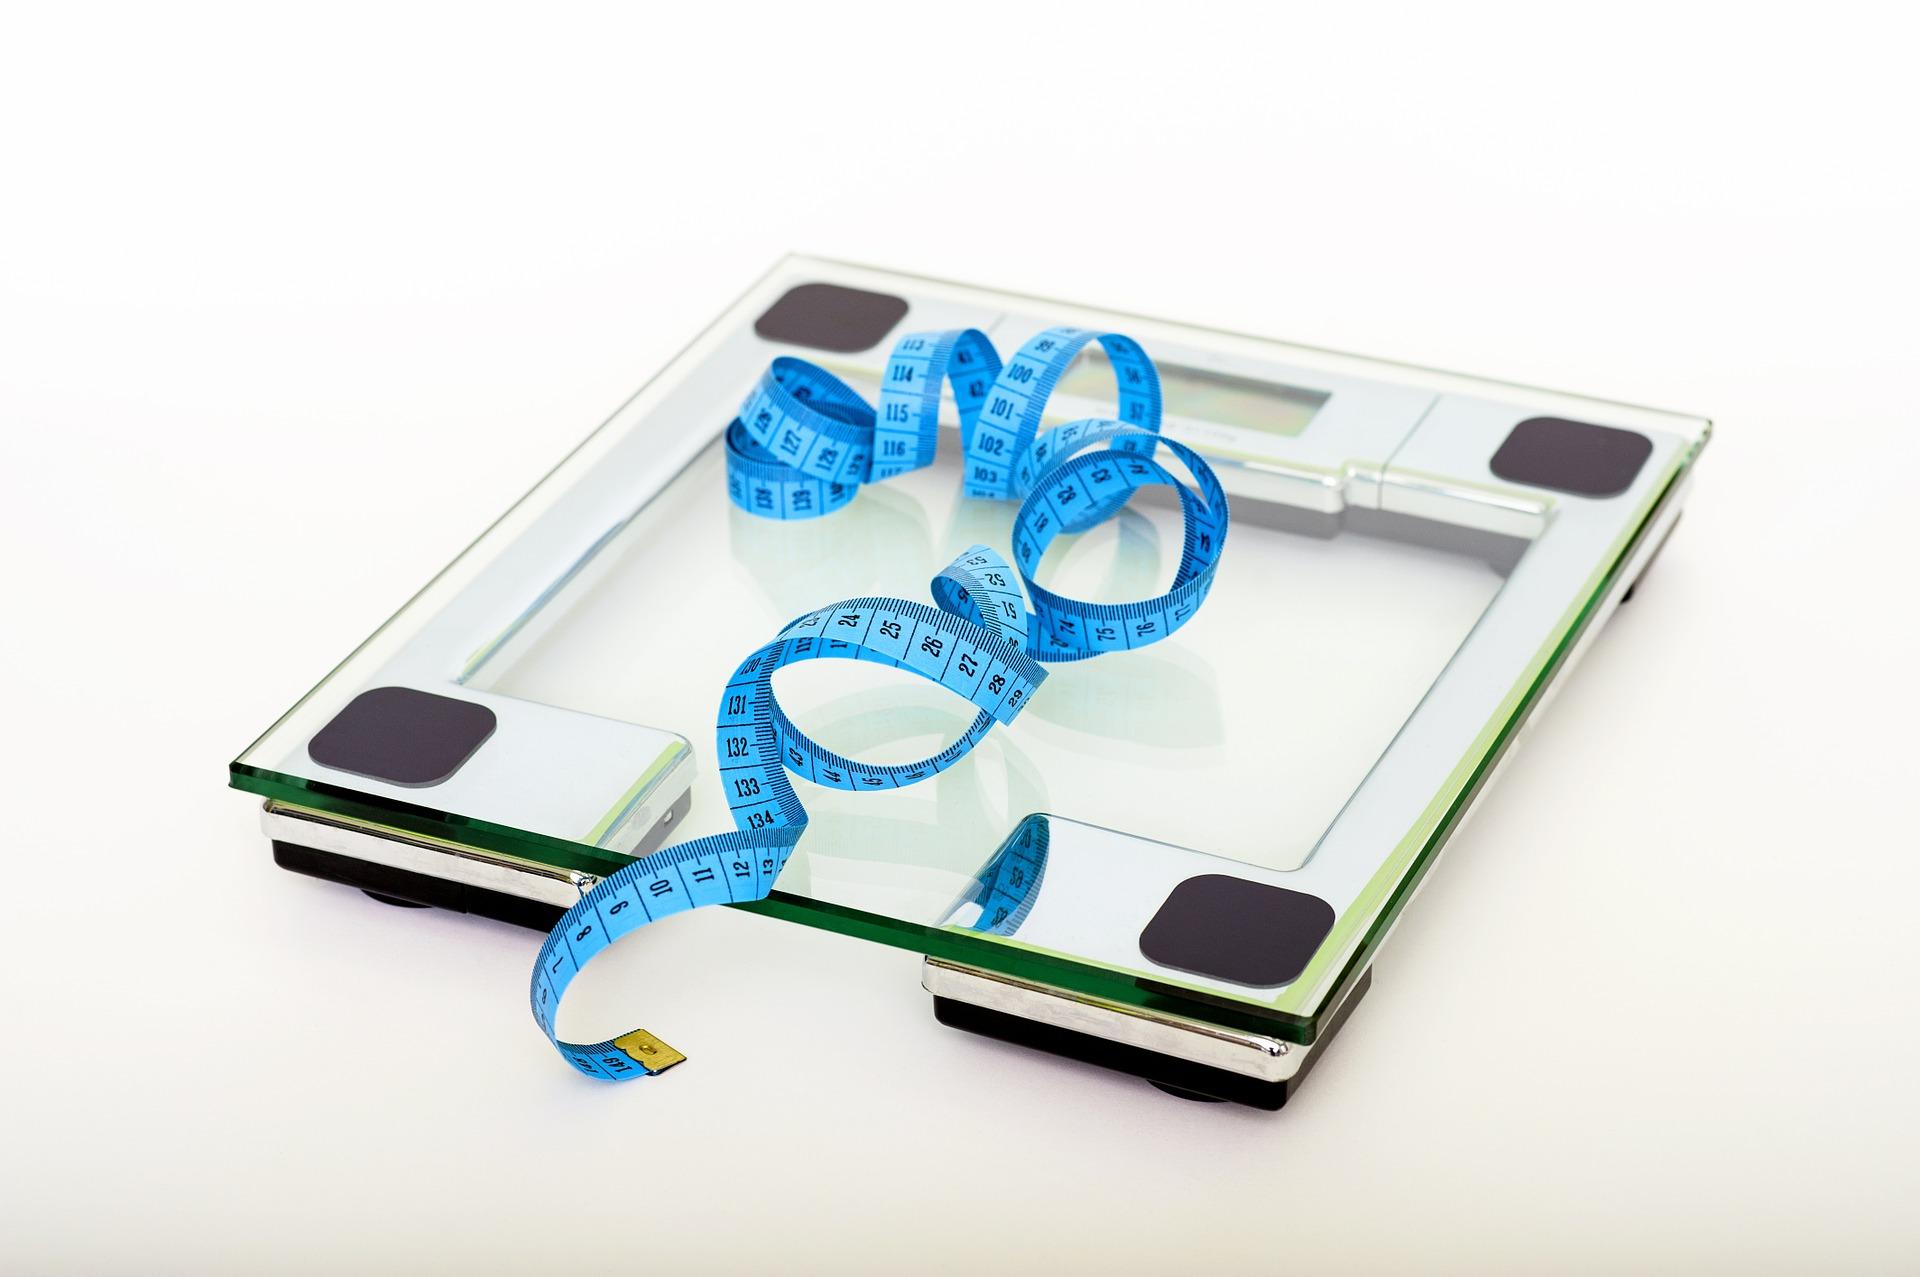 menšie prsia po diete